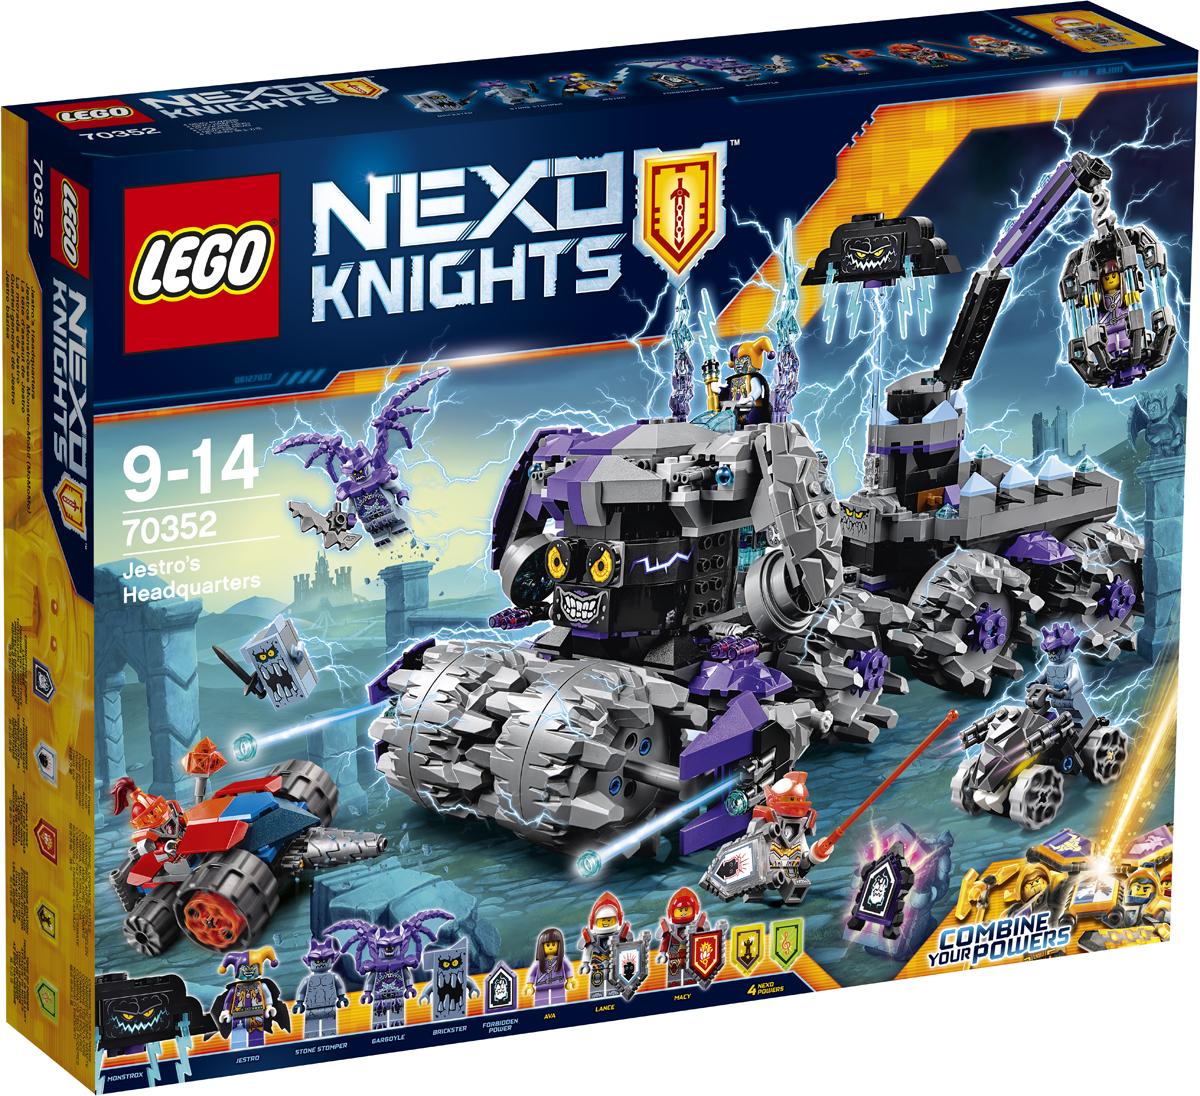 LEGO NEXO KNIGHTS Конструктор Штаб Джестро 70352 lego джестро мобиль 70316